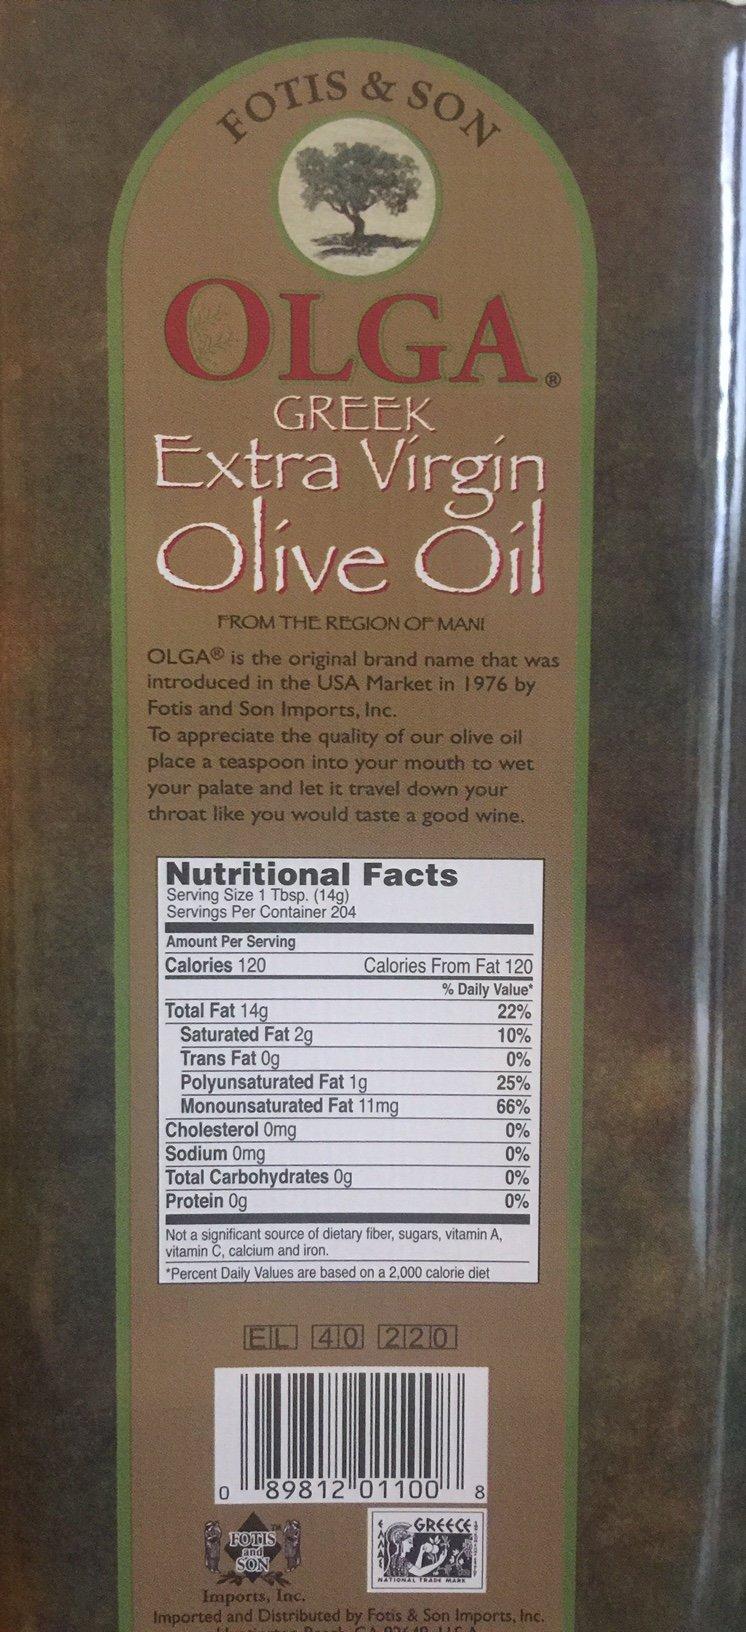 Greek Extra Virgin Olive oil Olga Brand 3 liter by Olga Extra Virgin Olive oil (Image #3)